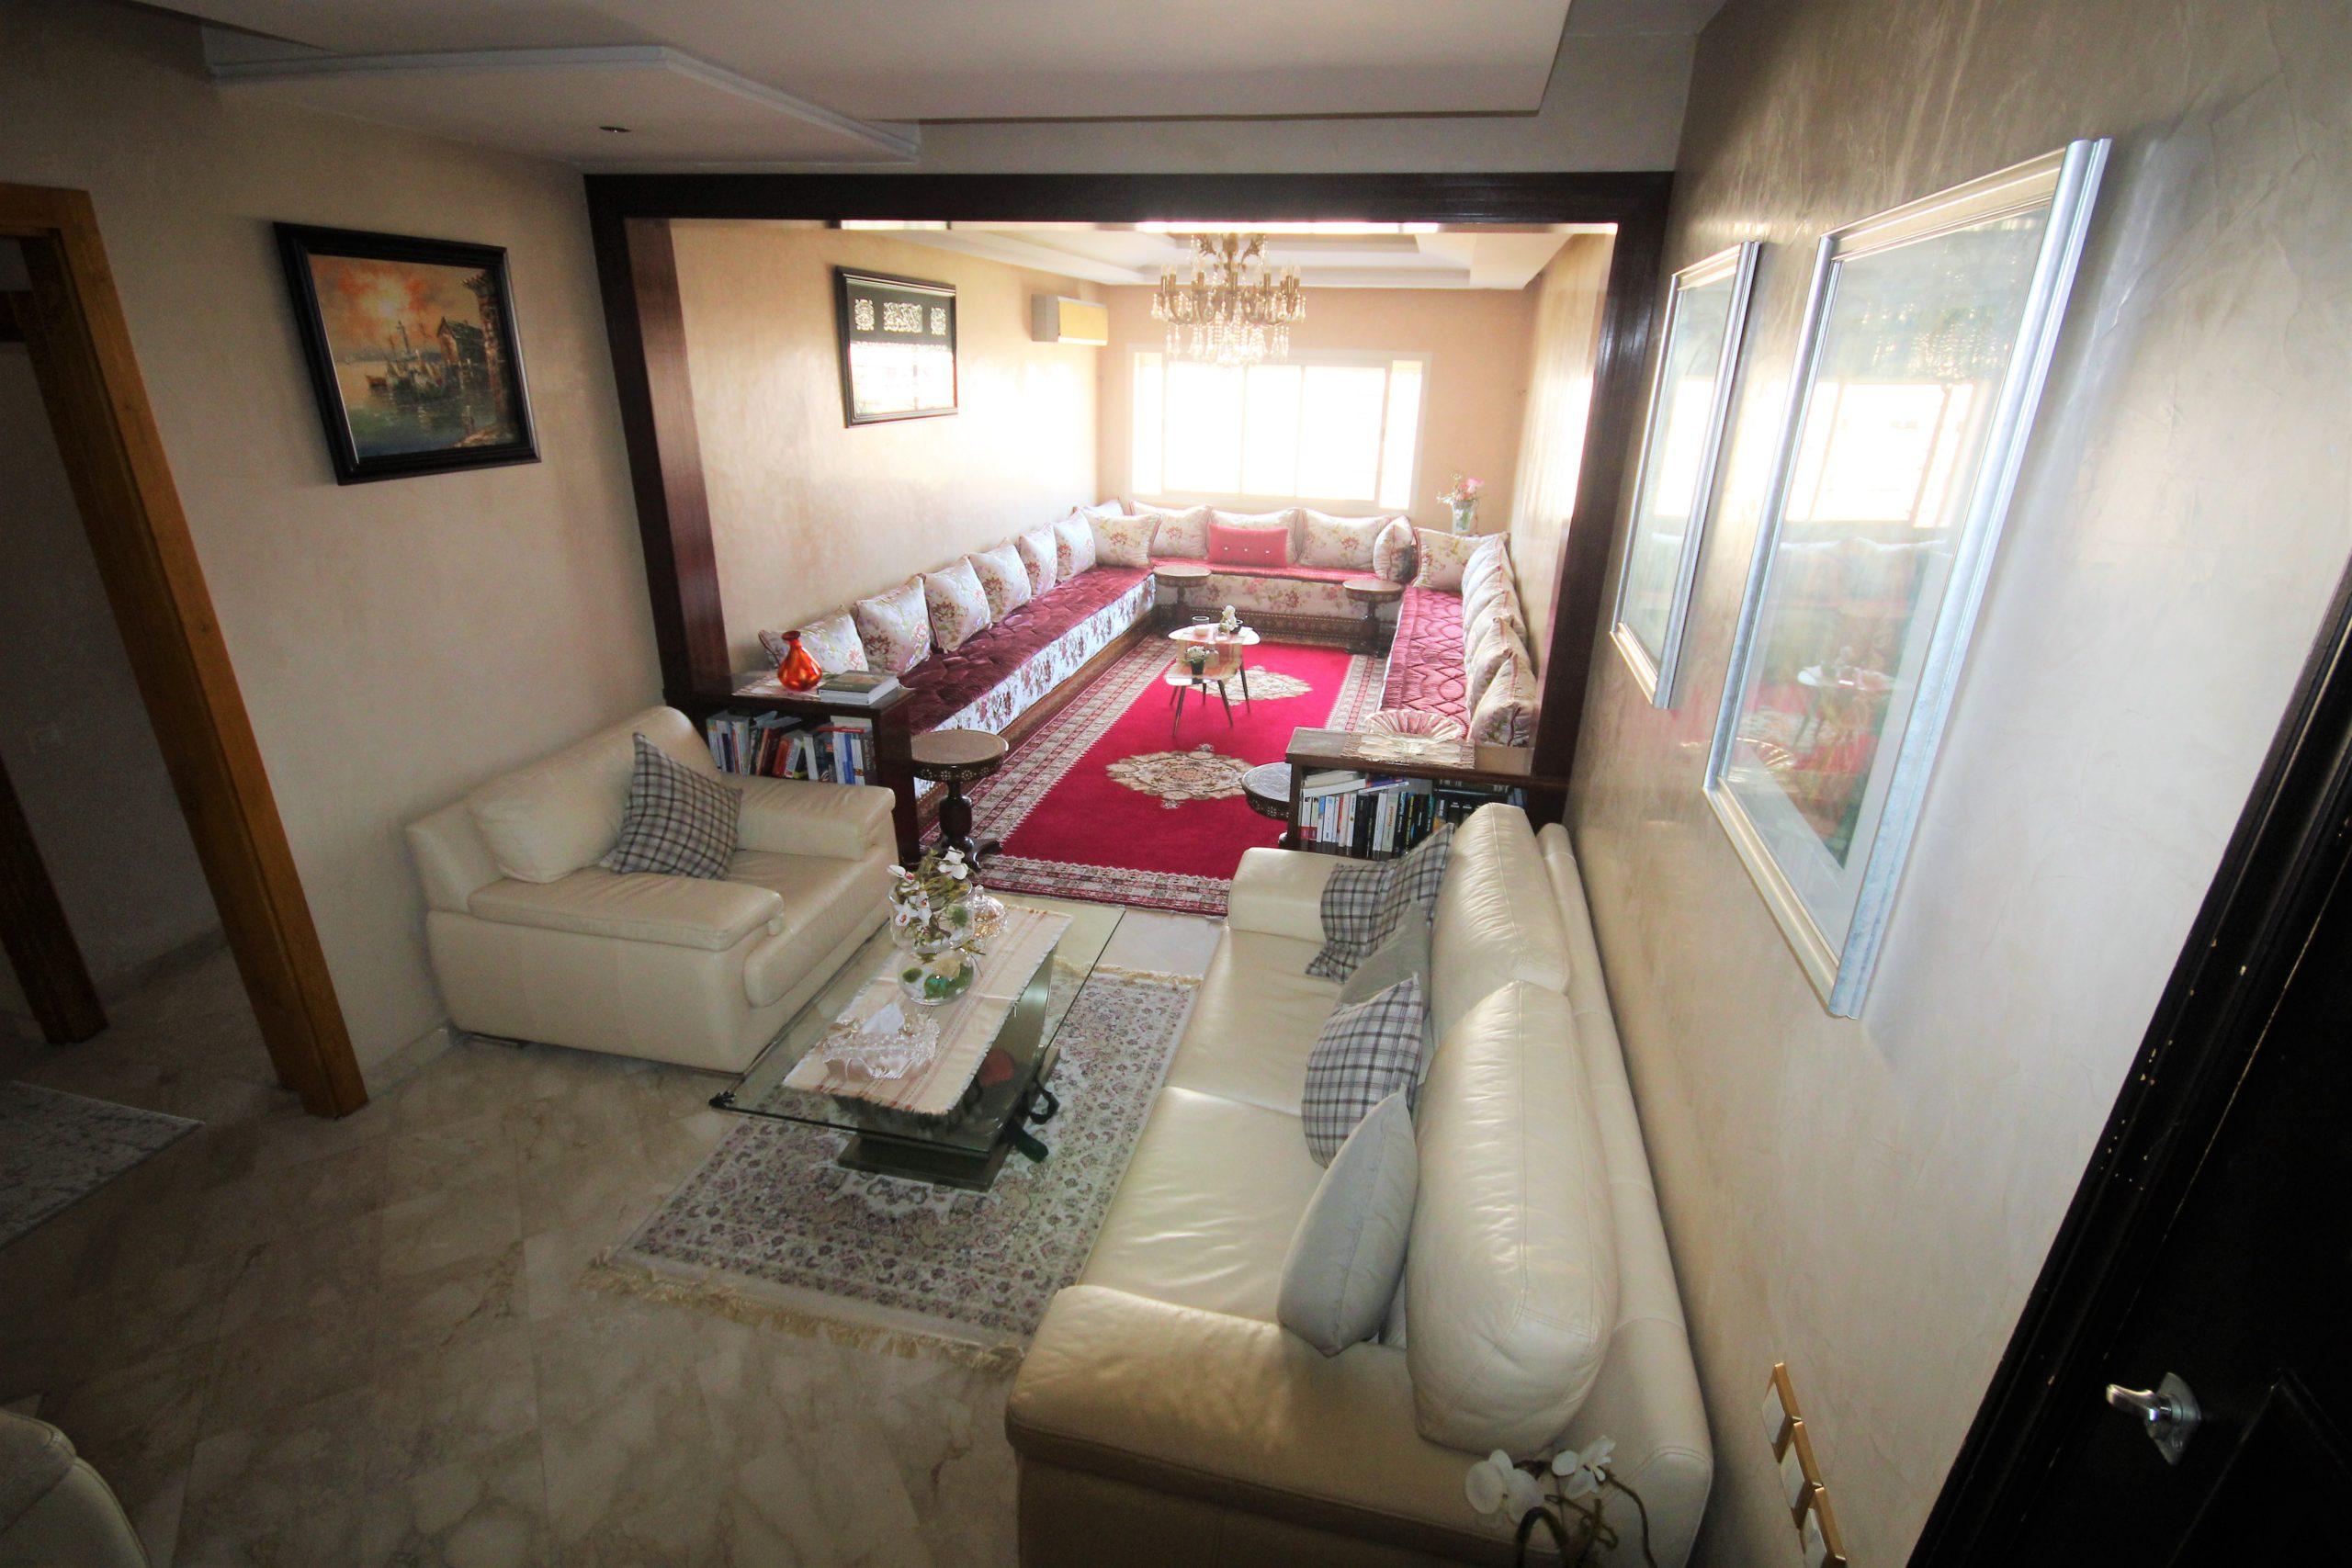 Maroc, Casablanca, Californie, vente d'appartement luxueux 3 chambres